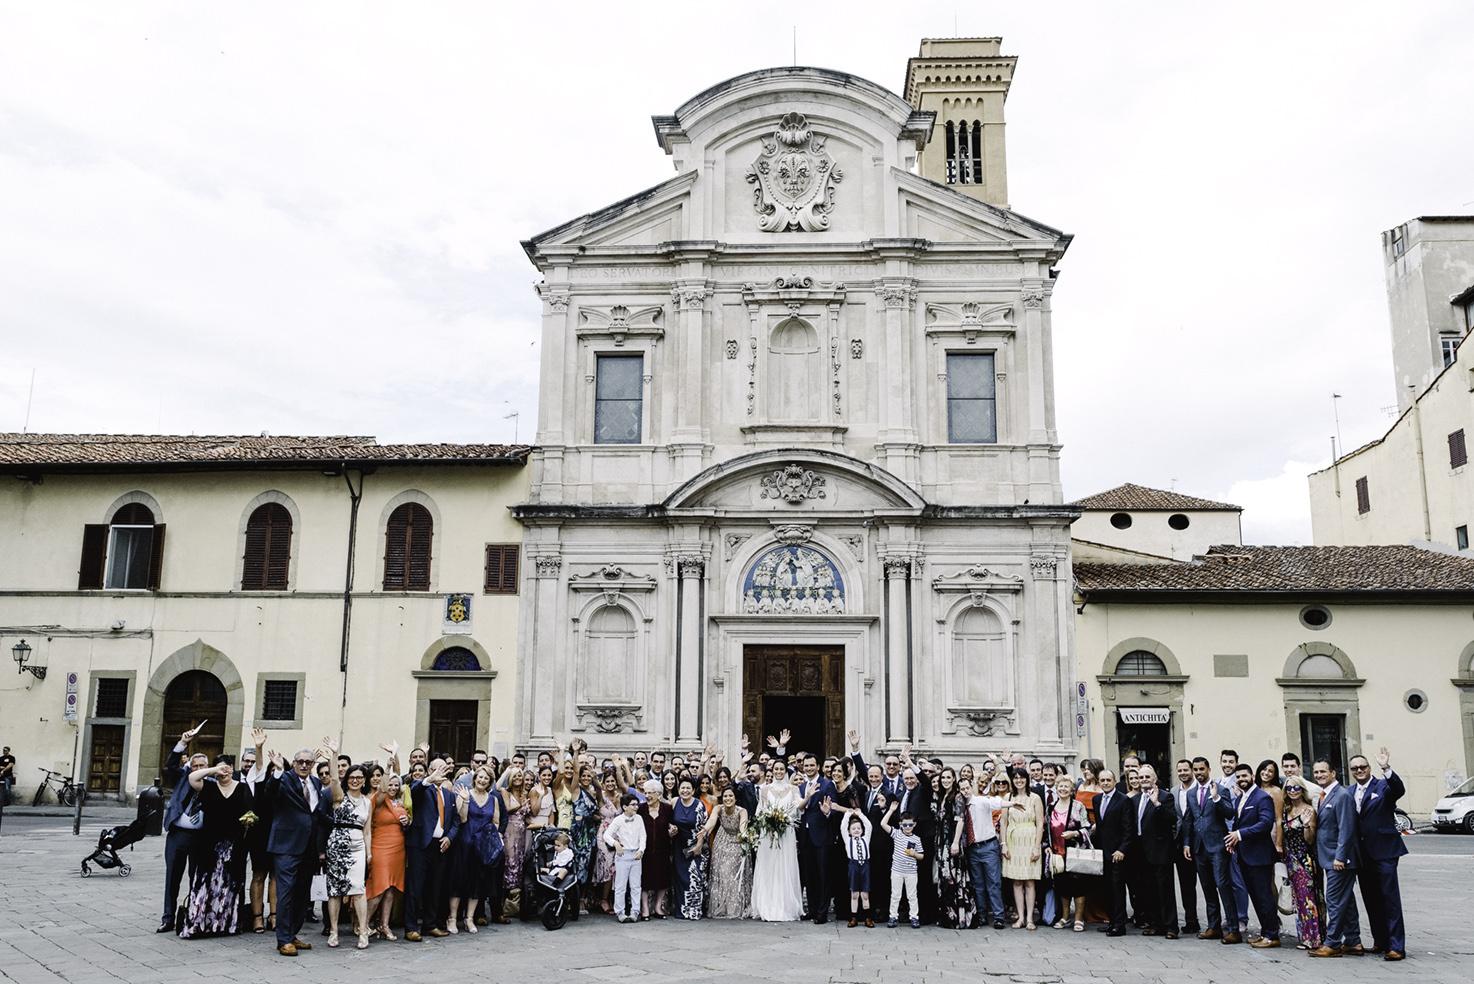 Catholic wedding at Ognissanti church in Florence